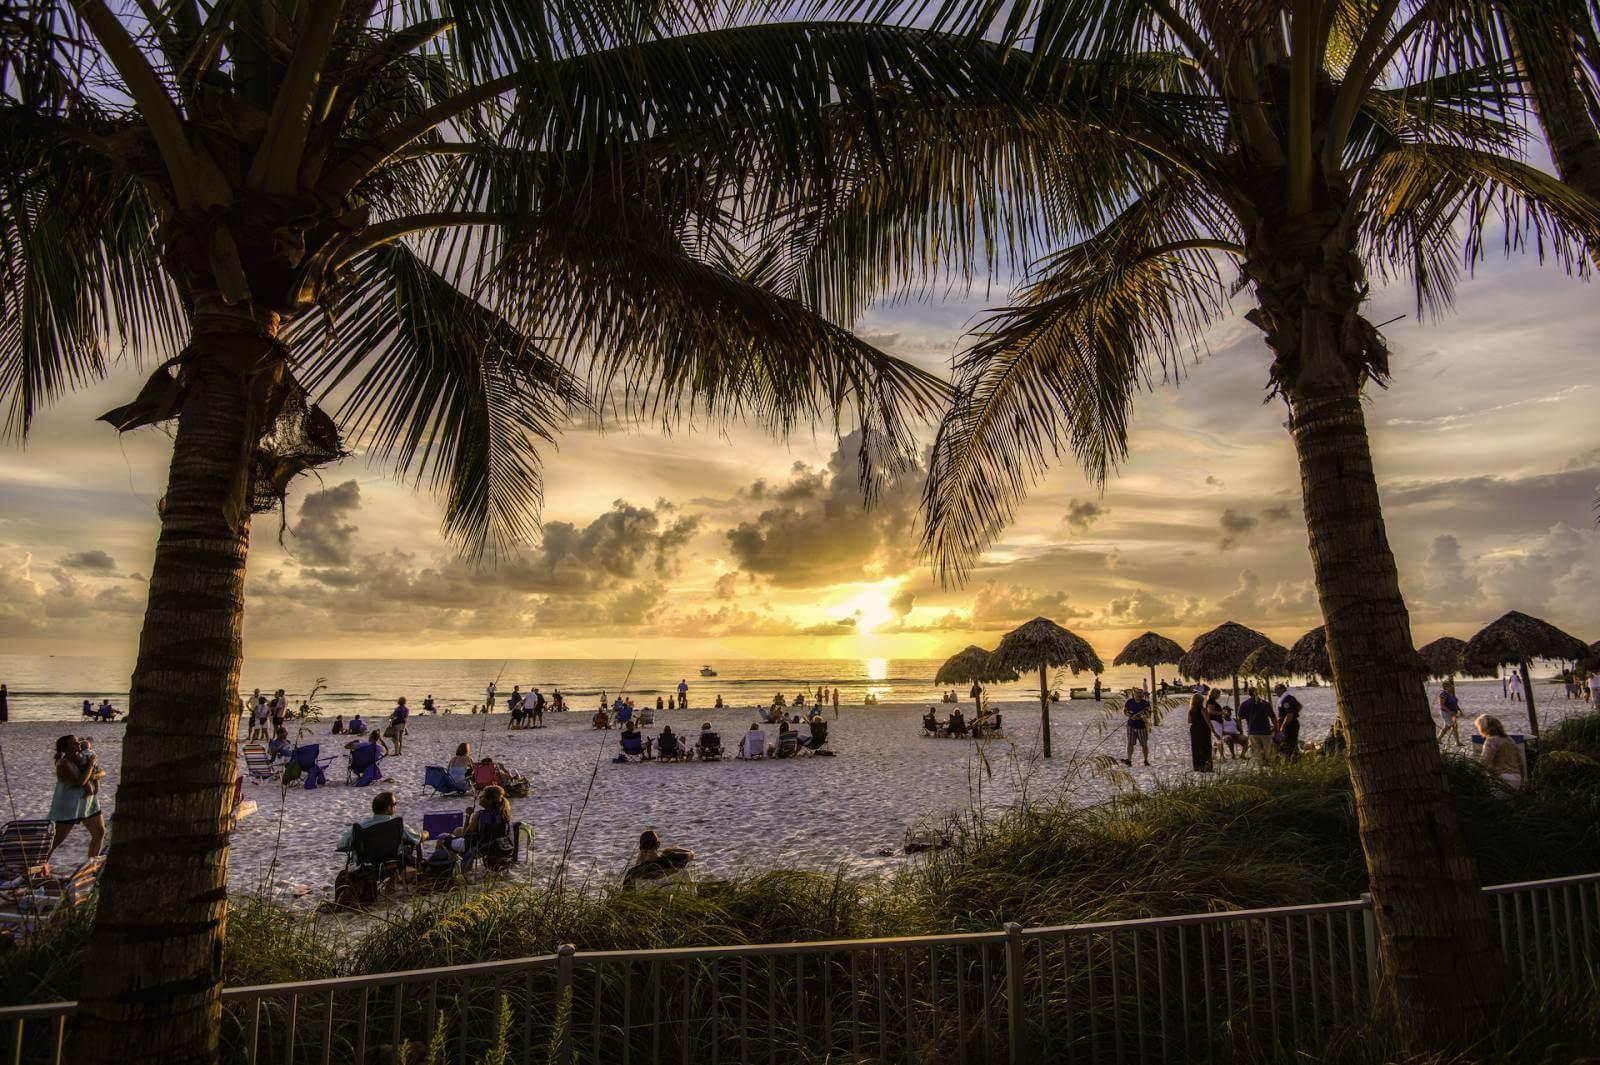 Beach visitors enjoy Clam Pass Beach Park at sunset in Naples, Florida.